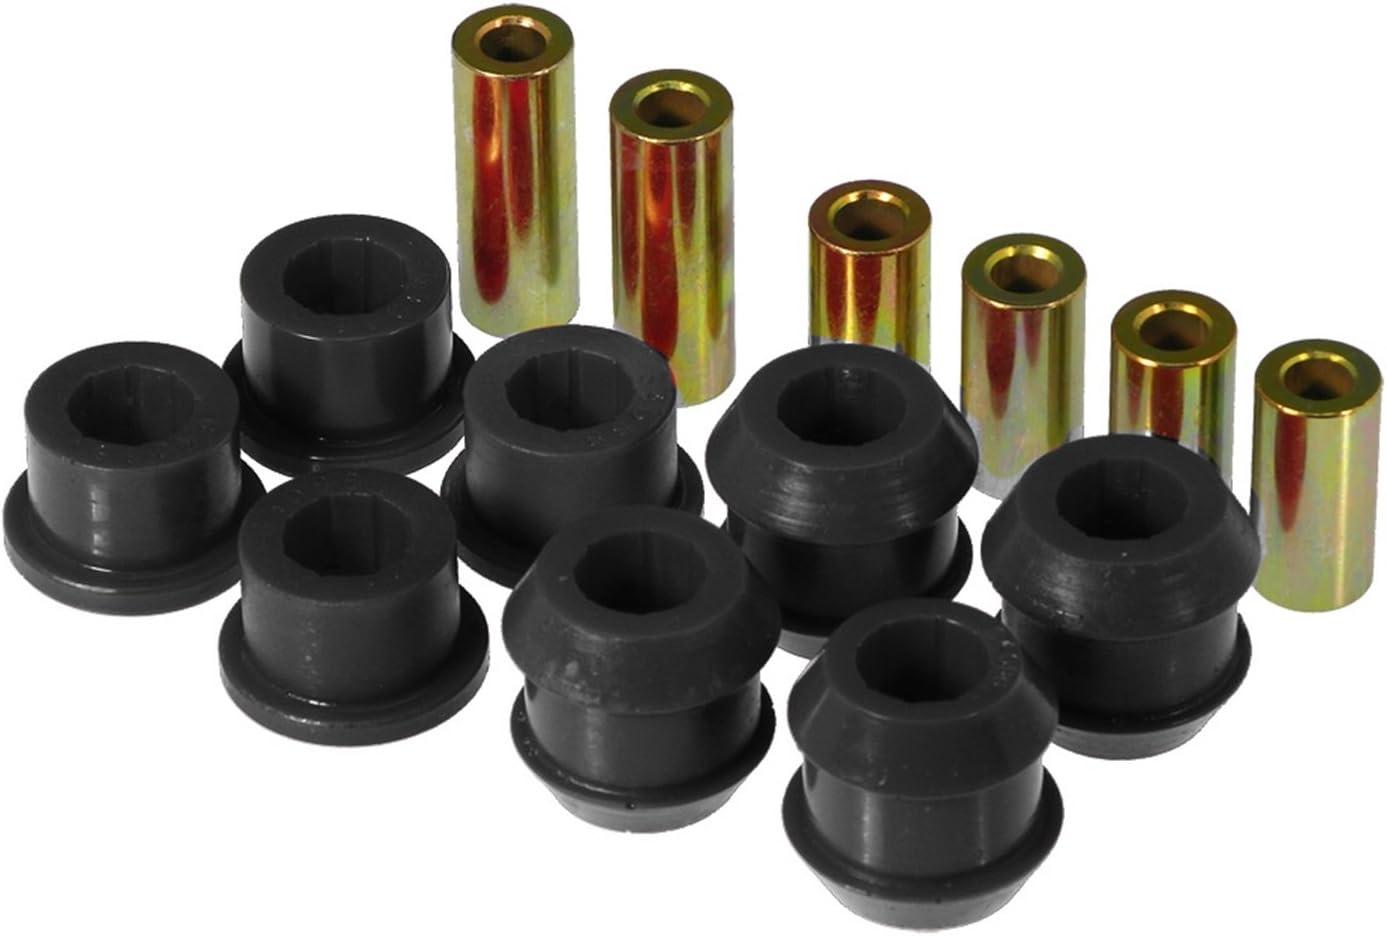 Prothane 8-206-BL Black Front Bushing Bombing free shipping Kit Cheap mail order shopping Arm Control